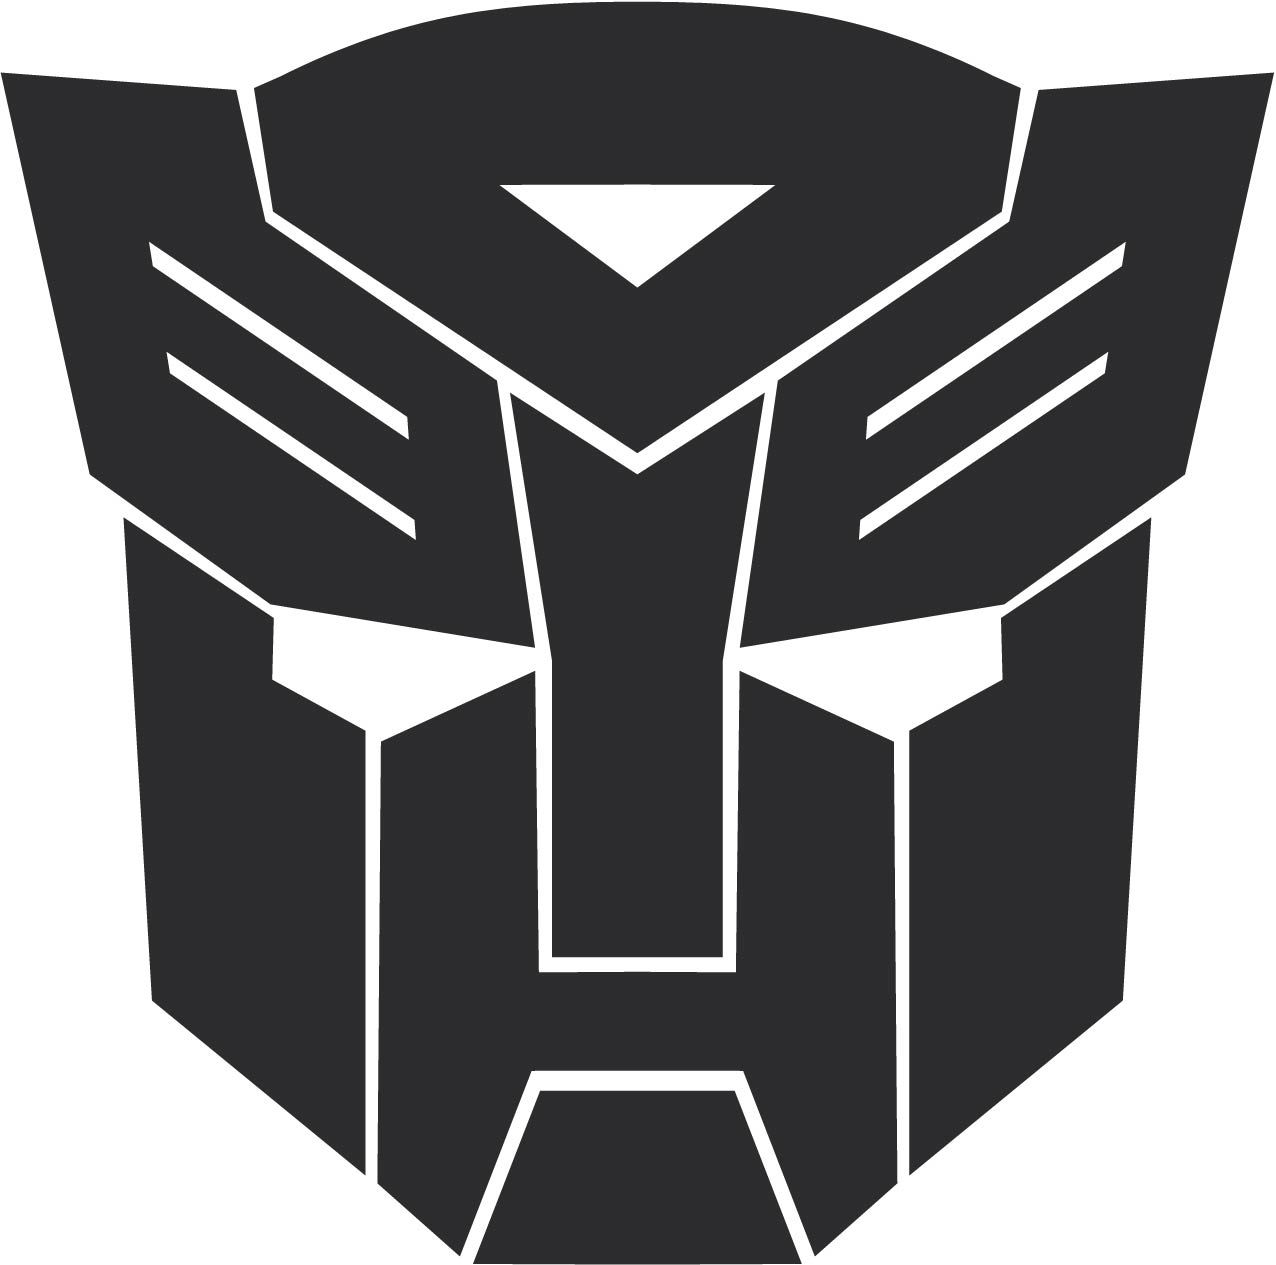 Autobot Transformers logo | Baby Shower | Pinterest | Transformers ...